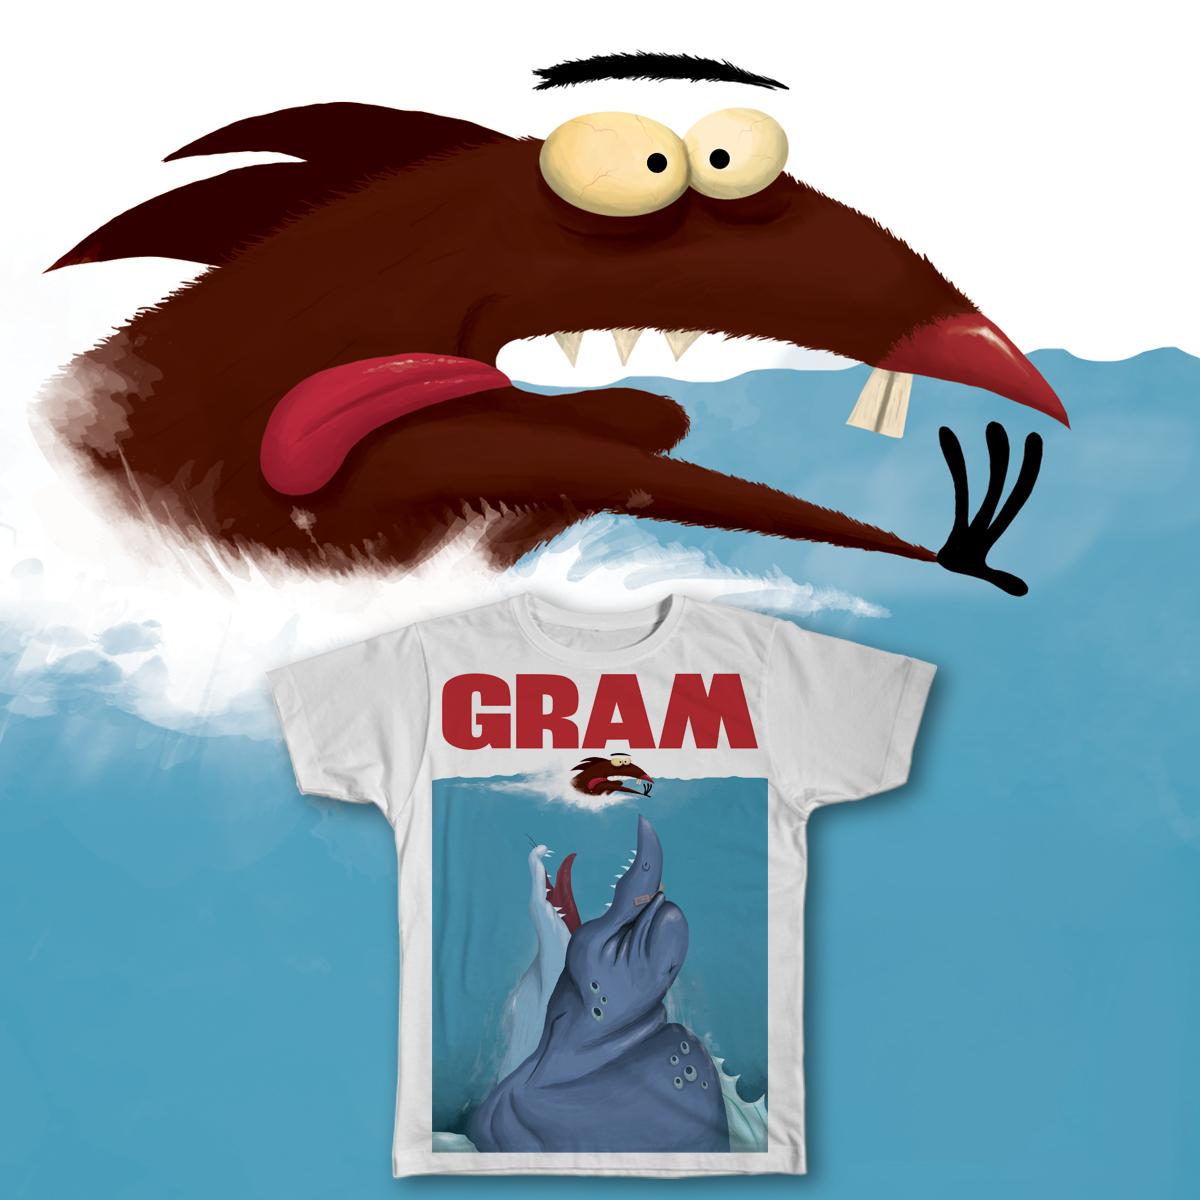 Ol' Gram! by KazerRenato on Threadless